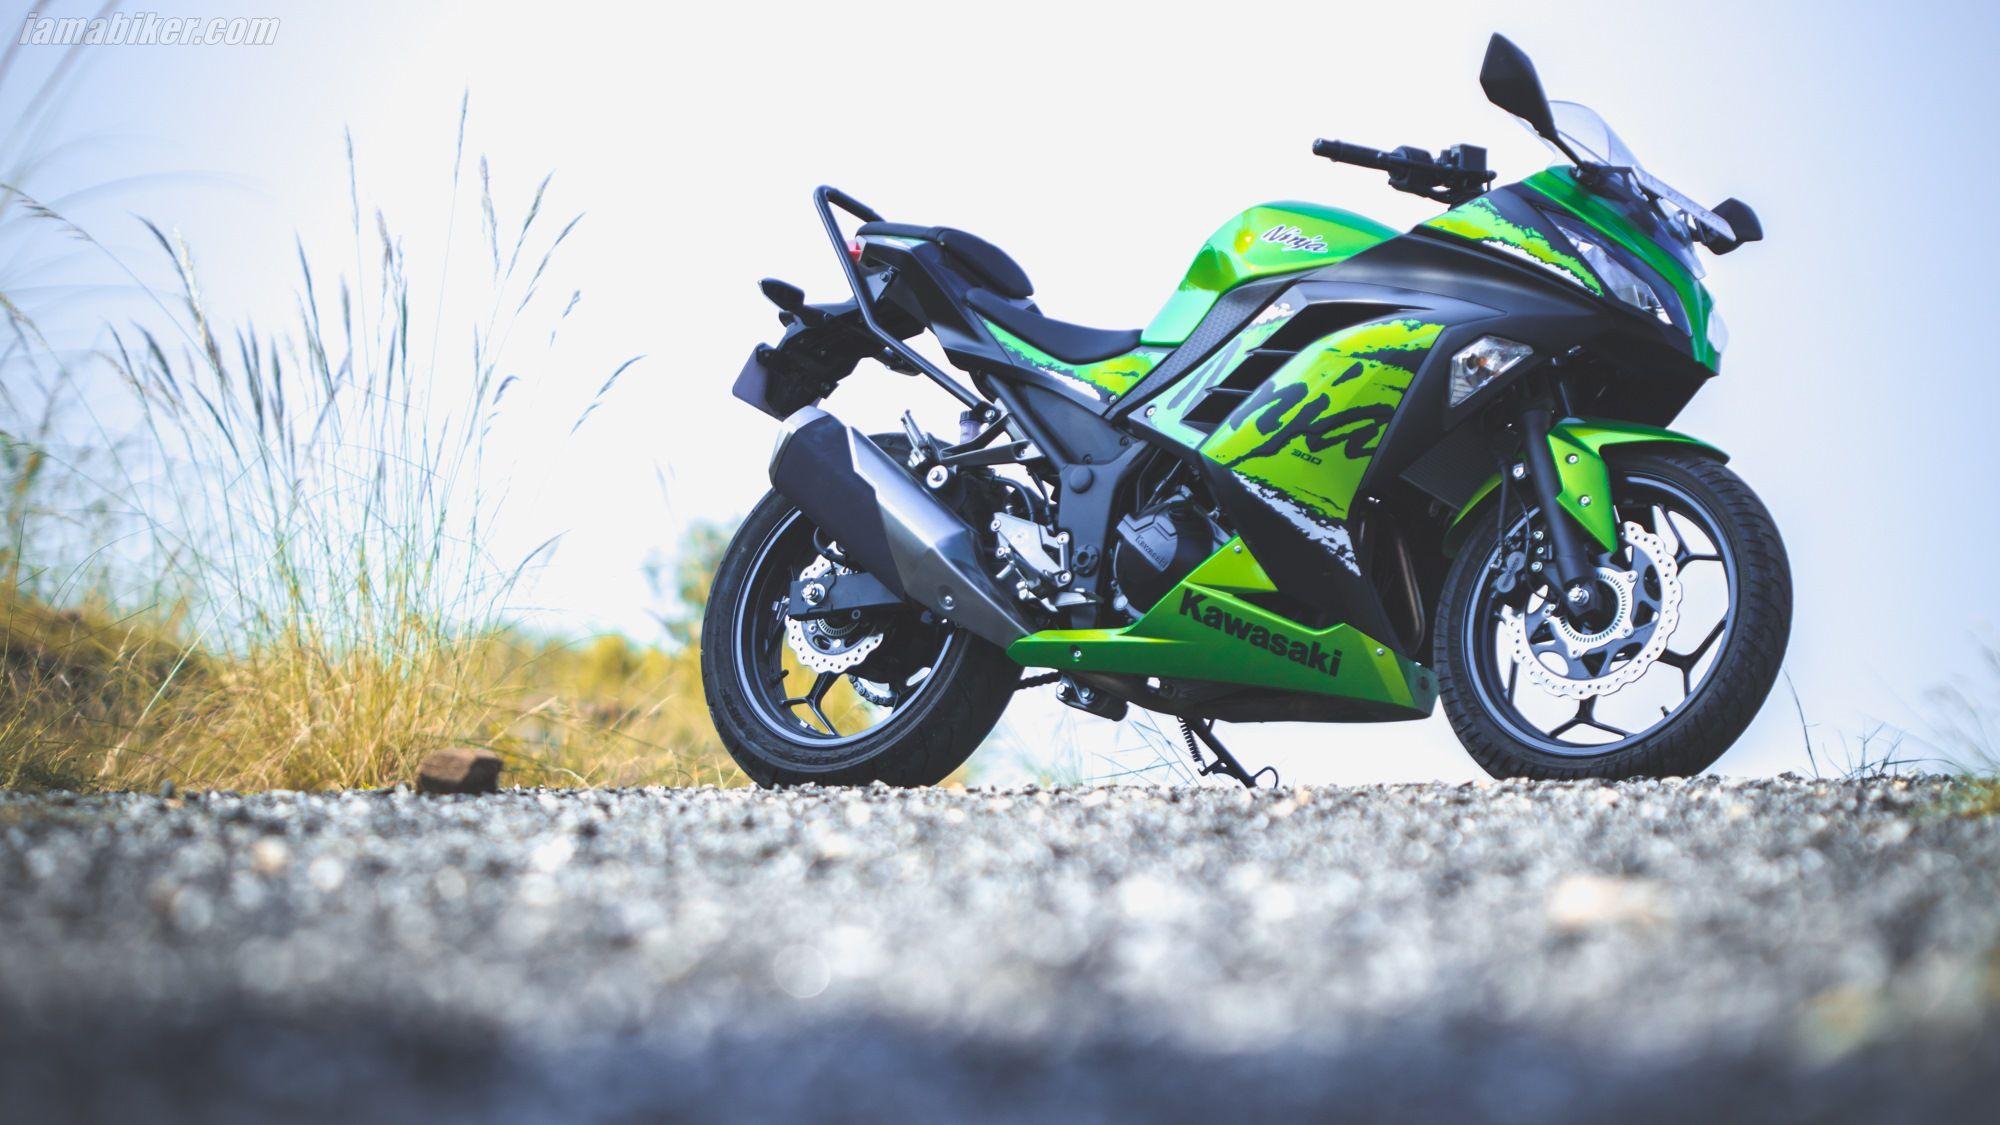 Kawasaki Will Keep Ninja 300 Alive Make It Bs 6 Compliant Kawasaki Ninja 300 Kawasaki Ninja Ninja Bike